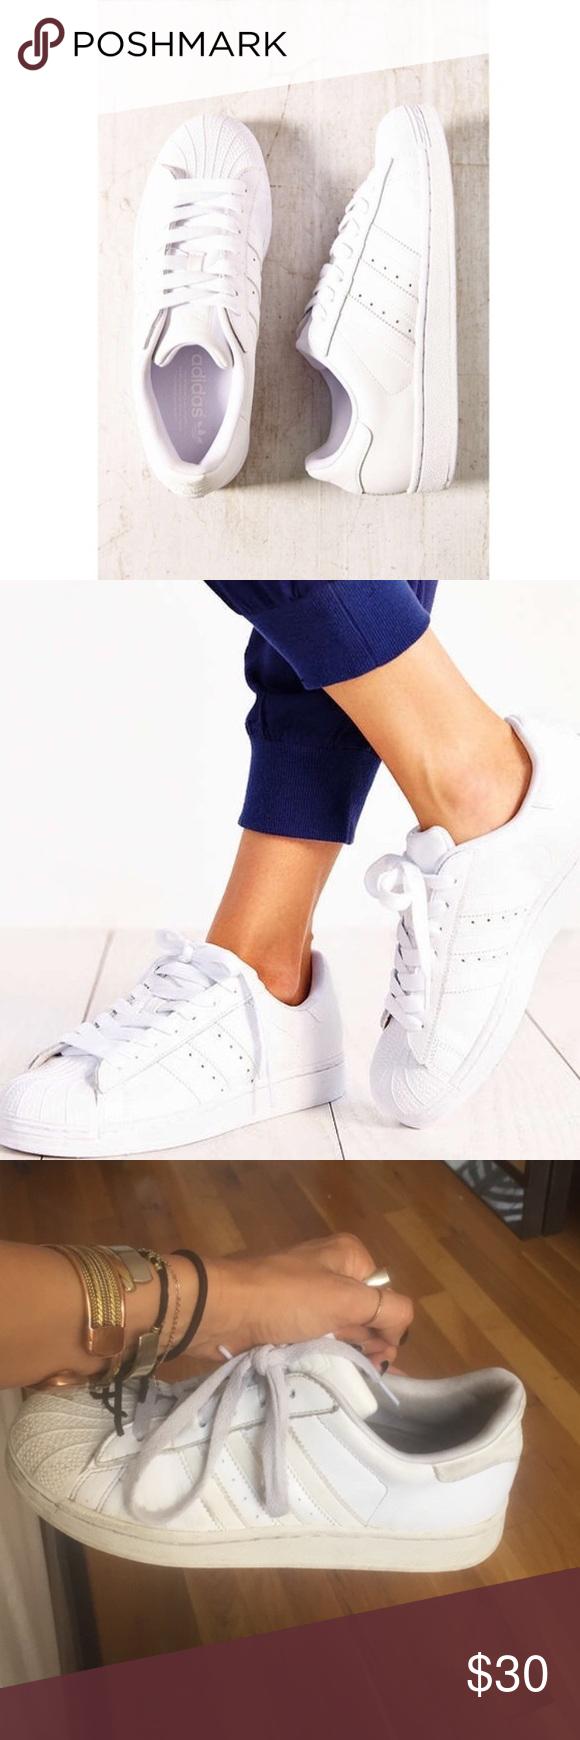 Originals Adidas Superstars womens size 7. mens size 5. decently worn but still look good! make an offer! Adidas Shoes Sneakers